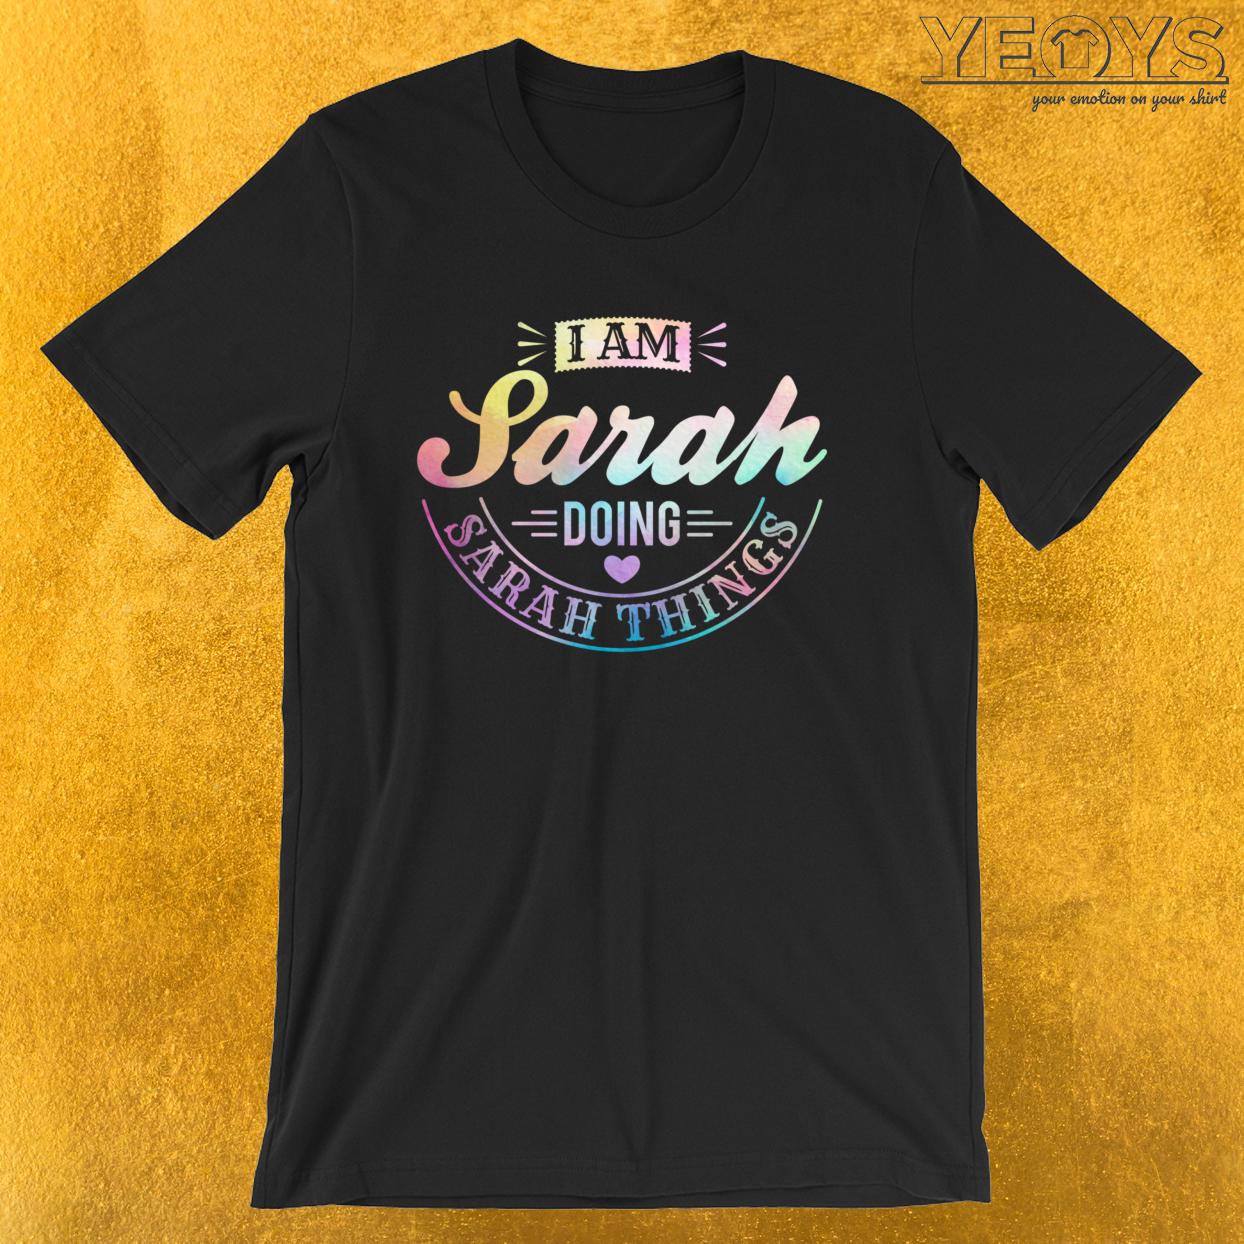 I Am Sarah Doing Sarah Things – Humorous Quotes Tee